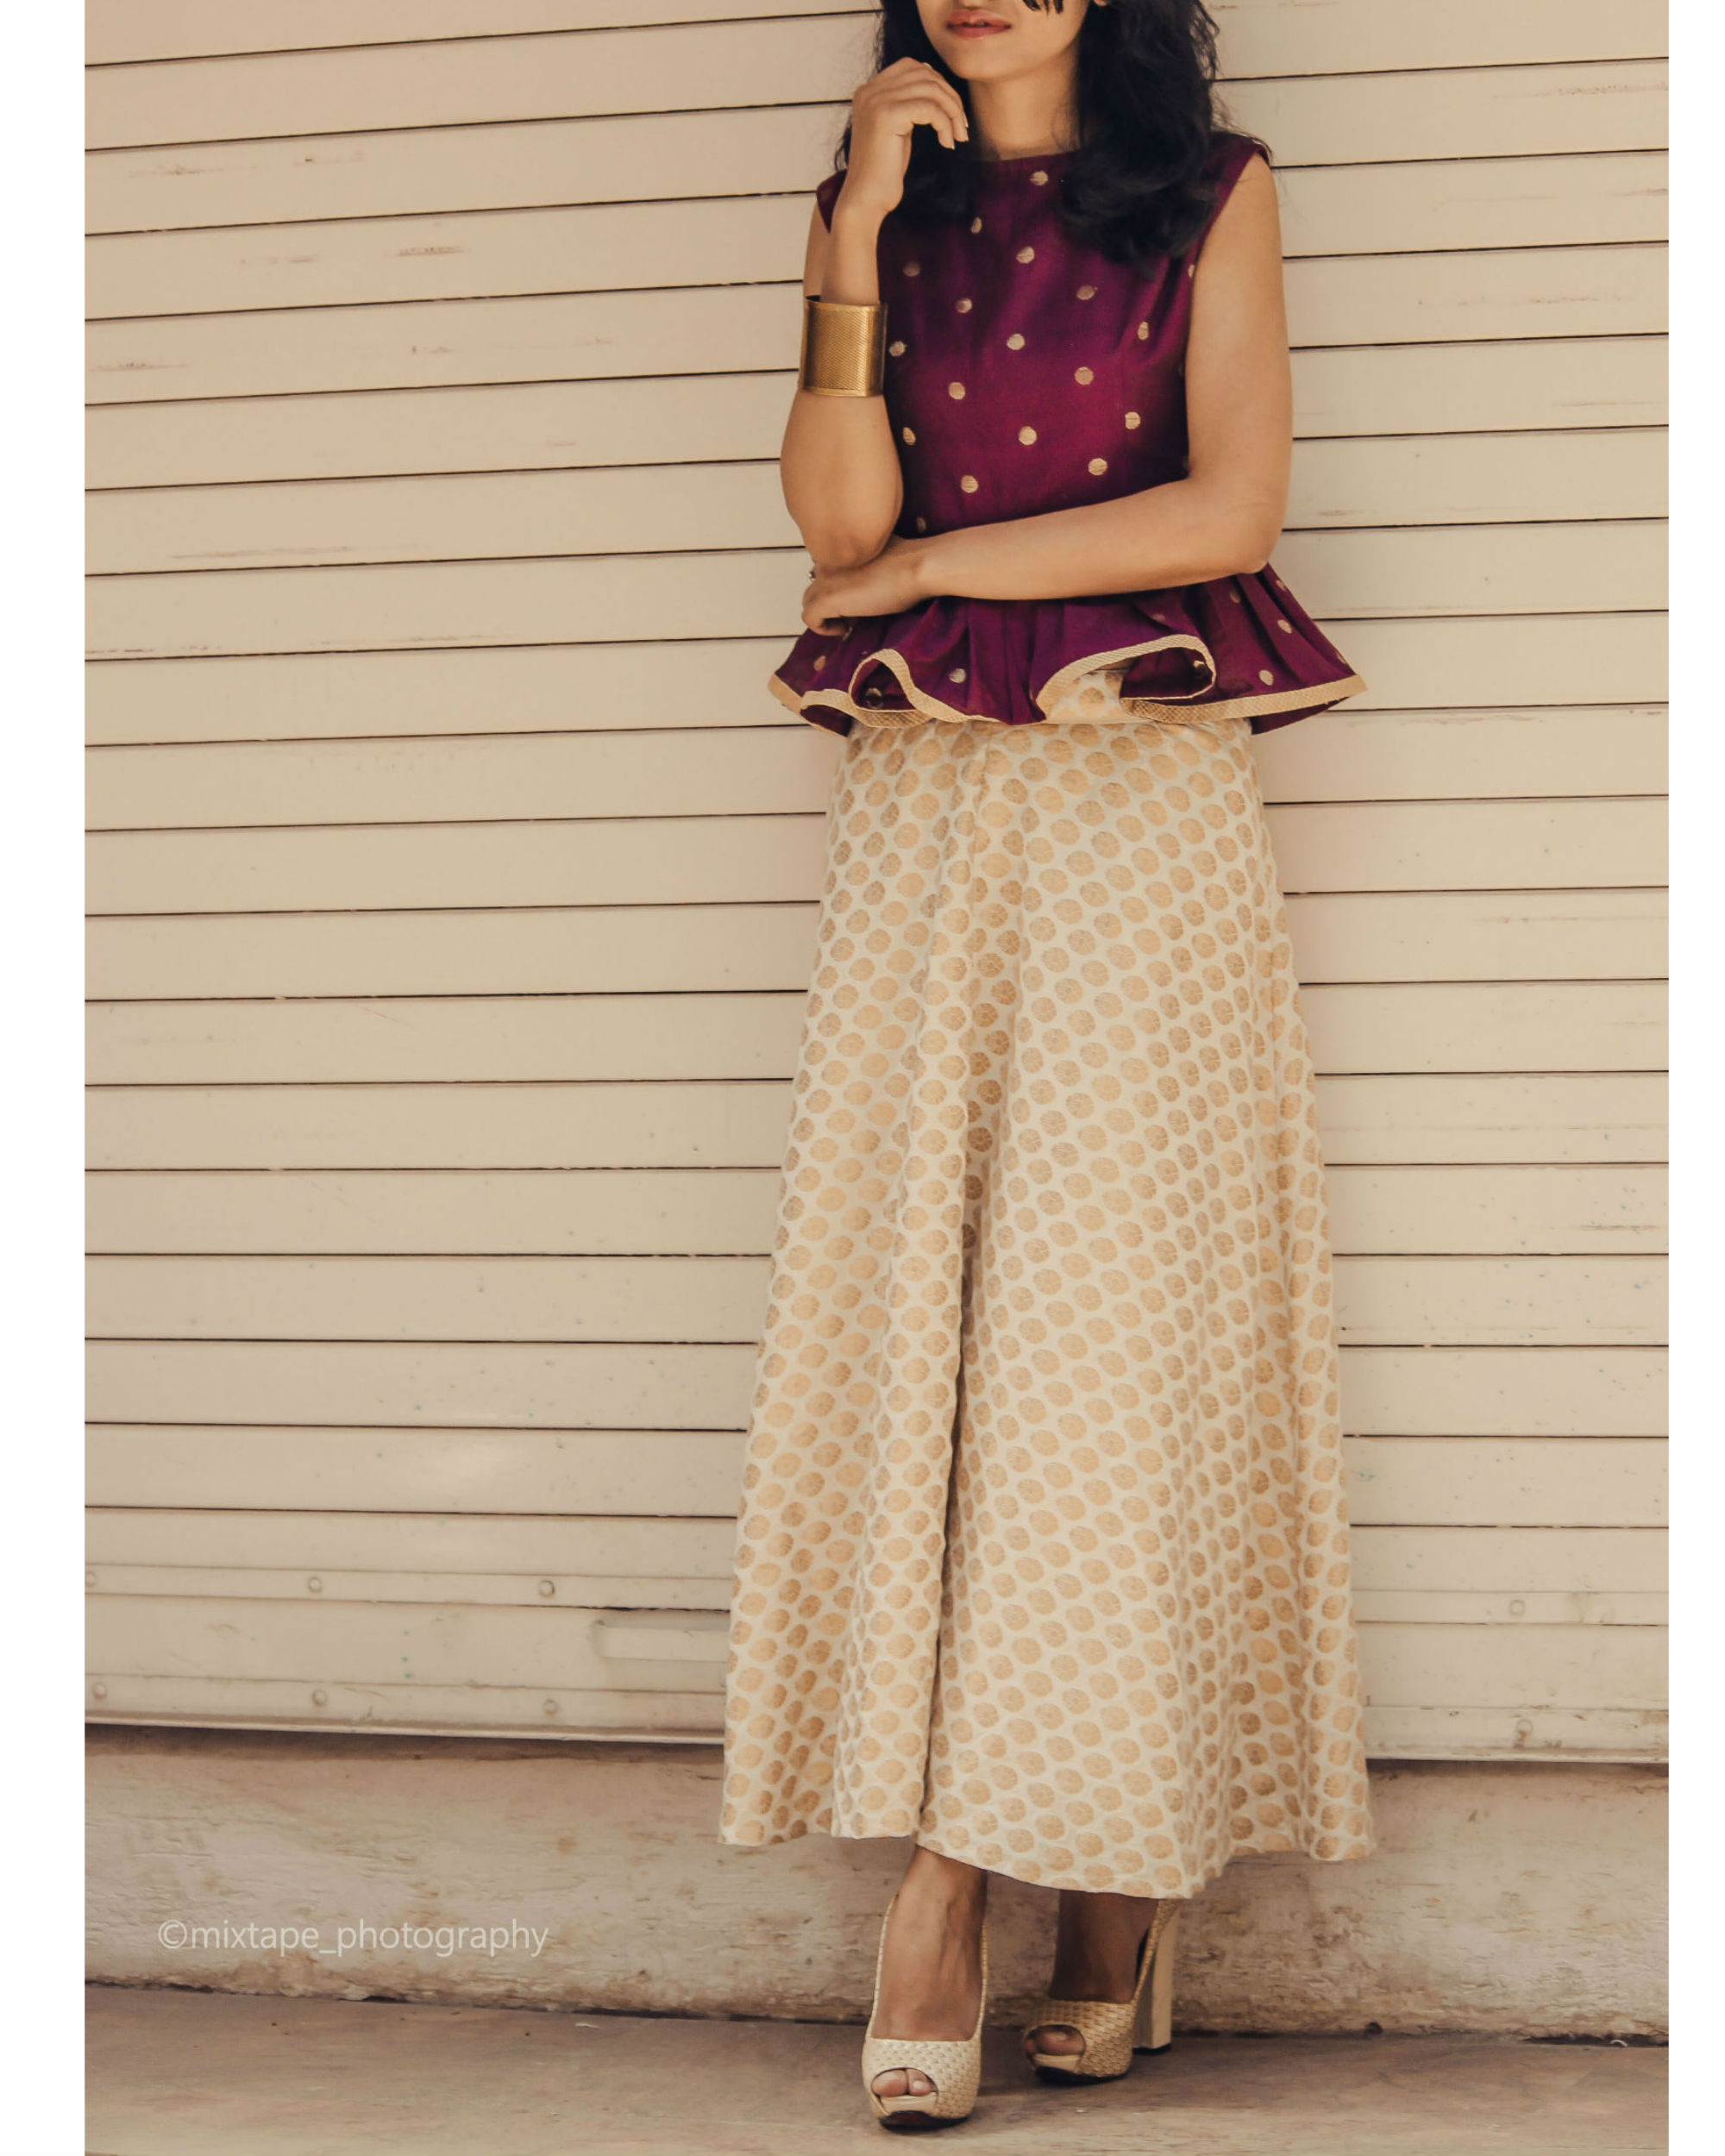 3ab4b90f4c6635 Berry peplum top and skirt set by Ekta   Sonal